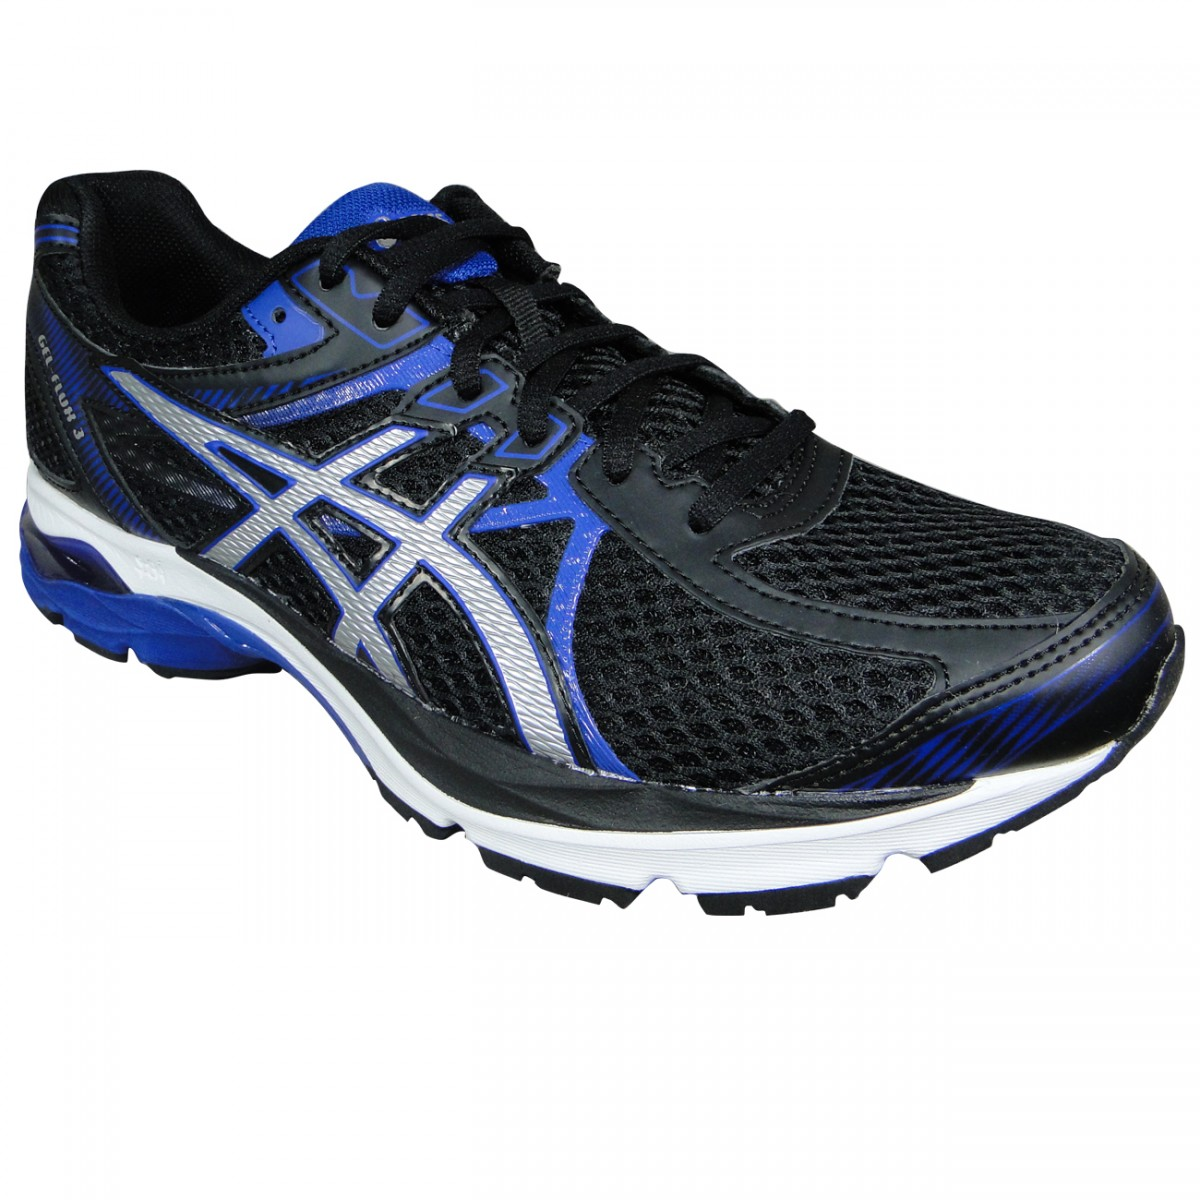 Tenis Asics Gel-Flux 3 T614N 9093 - Preto Prata Azul - Chuteira Nike ... 851a1e37b4762